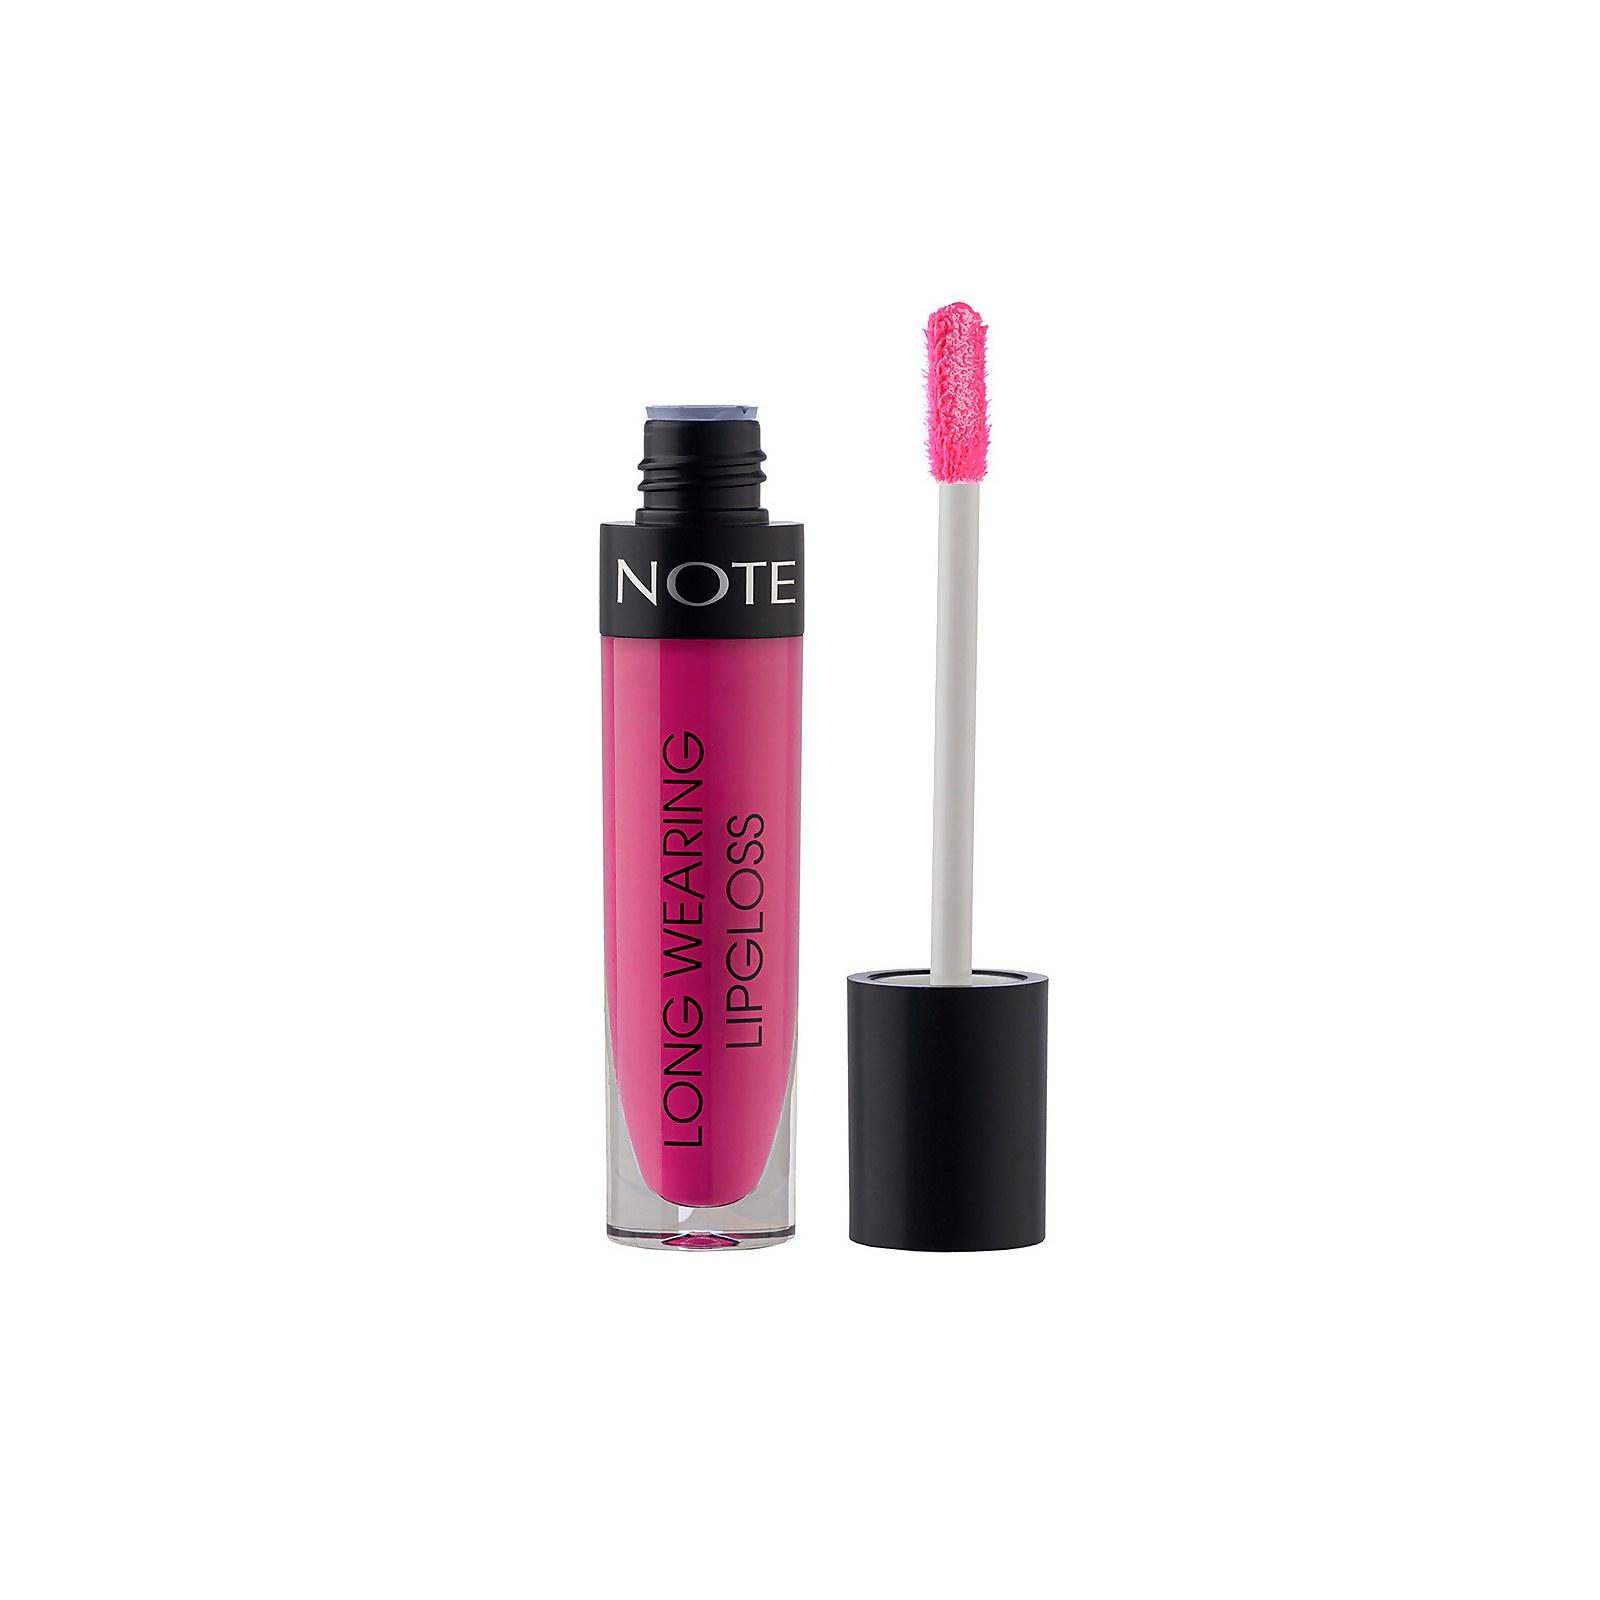 Купить Note Cosmetics Long Wearing Lip Gloss 6ml (Various Shades) - 17 Fuchsia